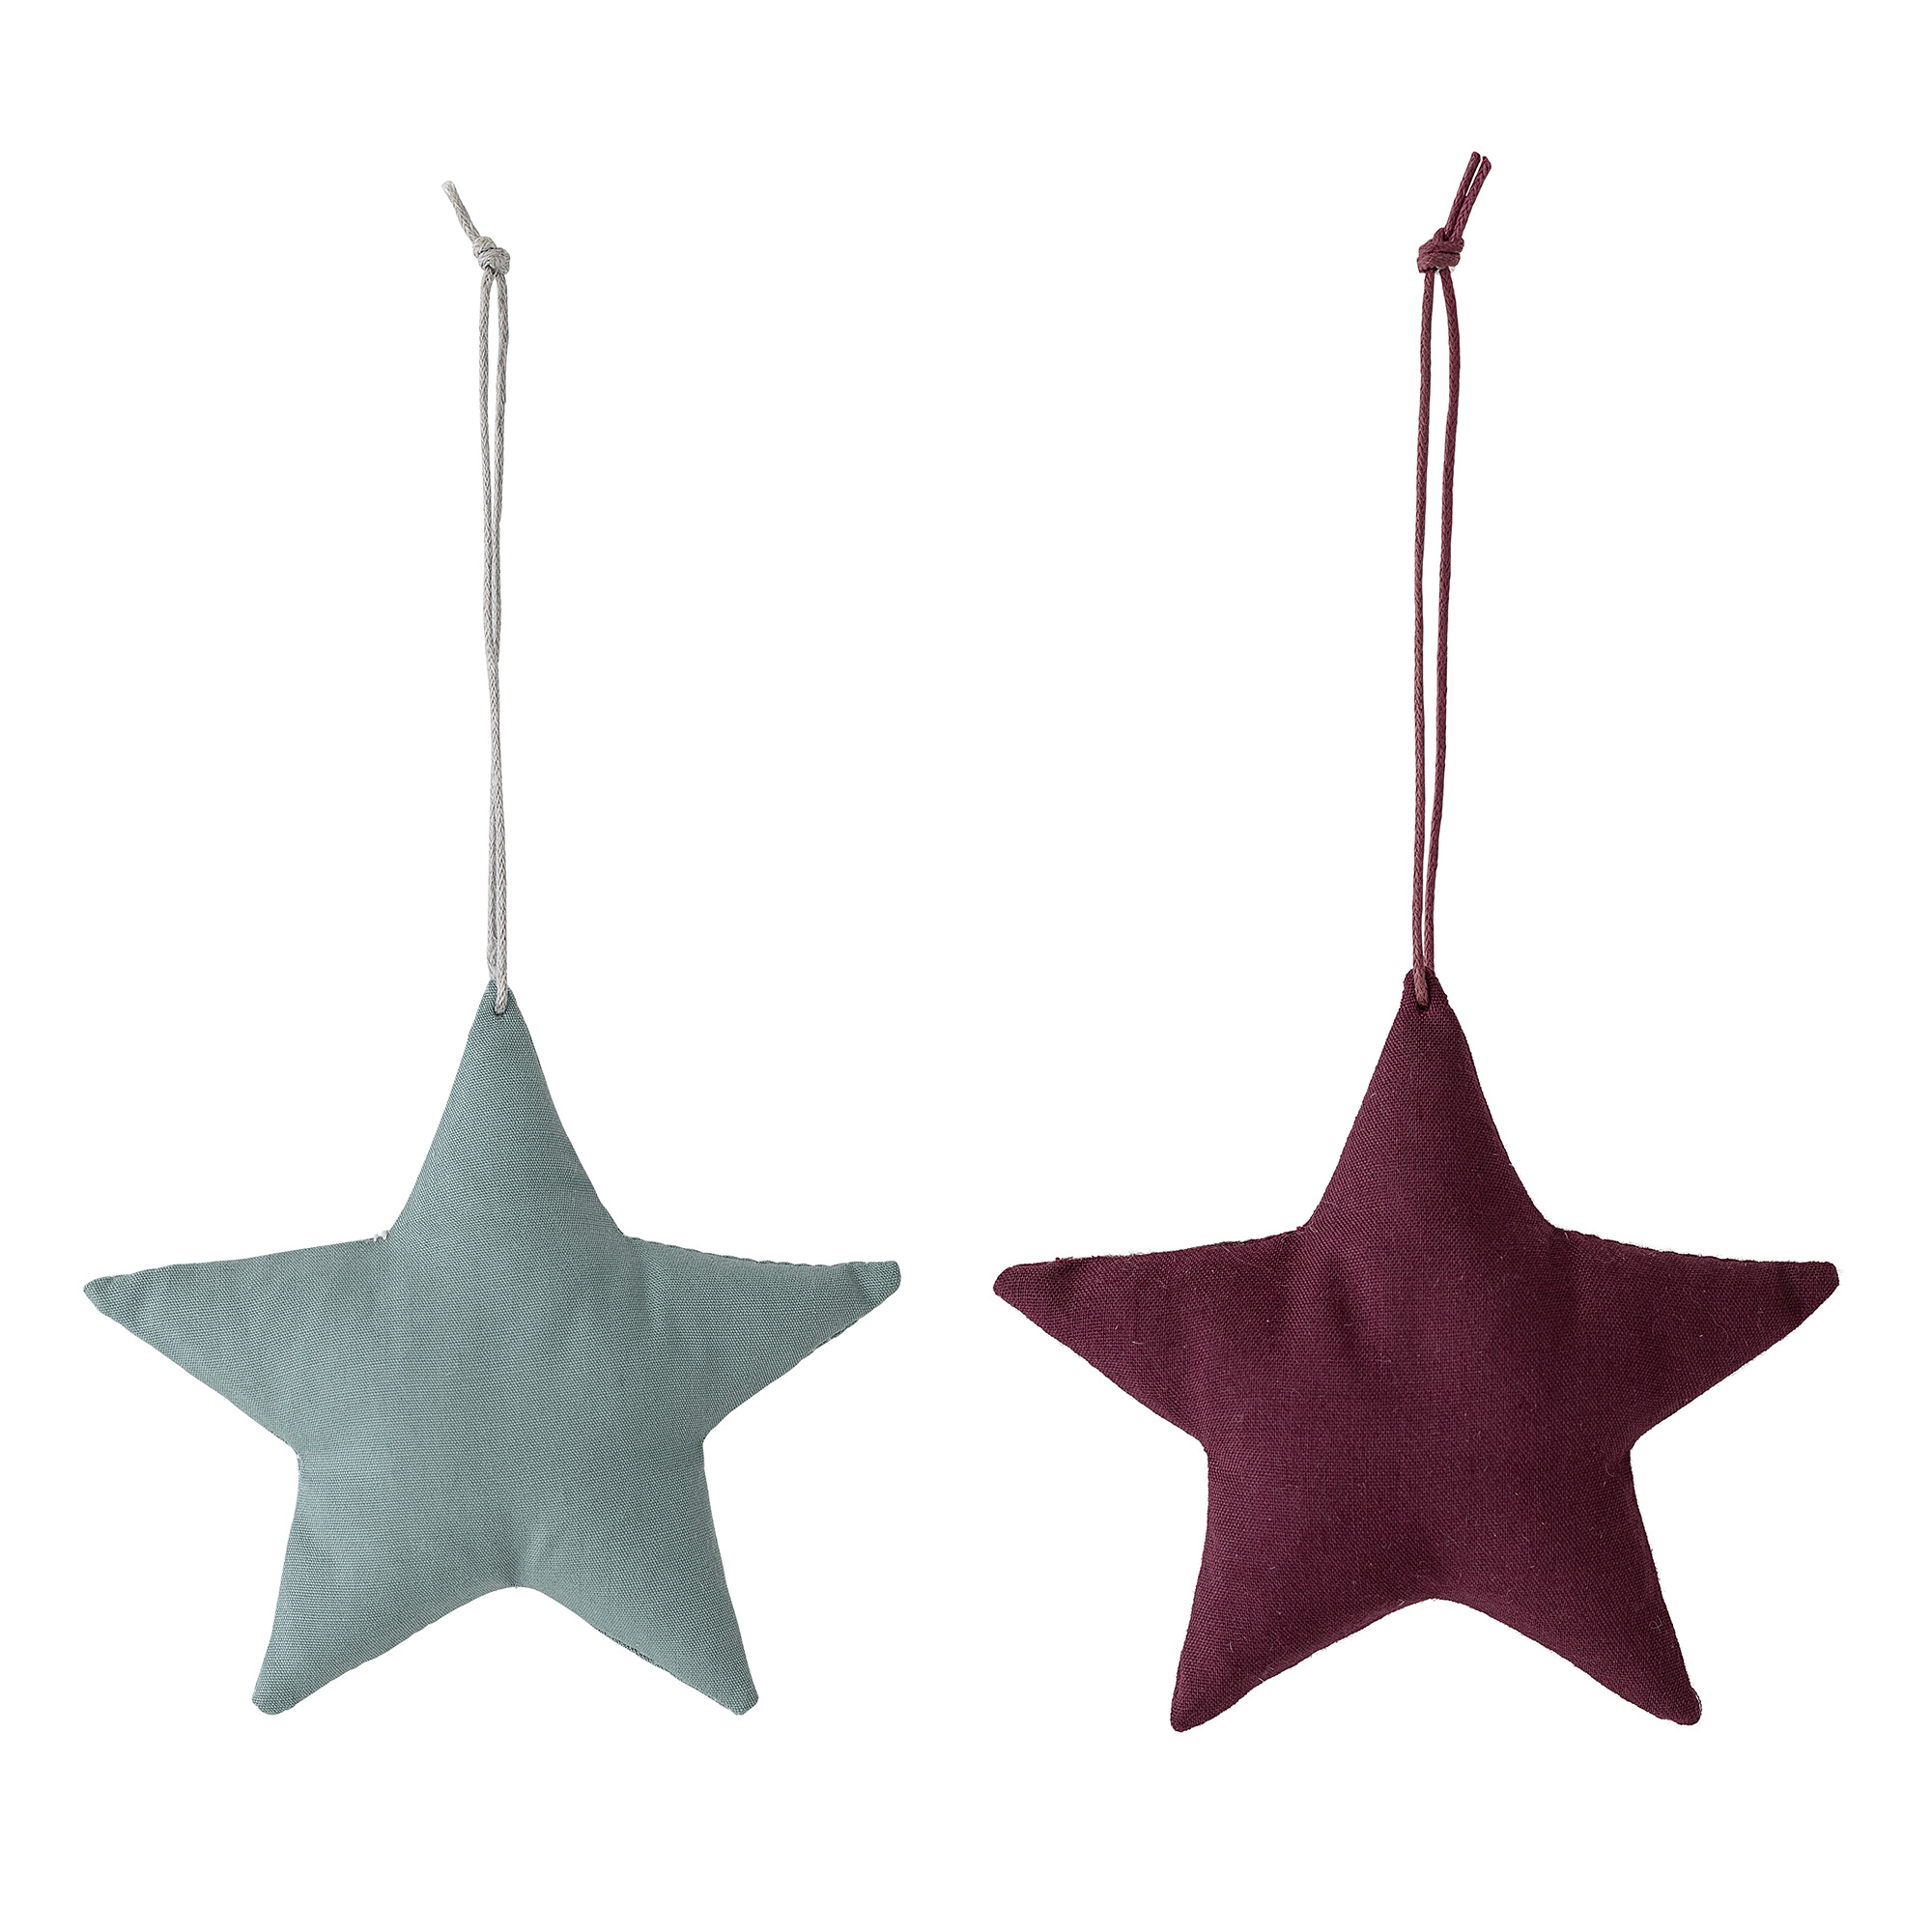 081c54b0 Star Ornament, Multi-color, Cotton - DesignNut.ee